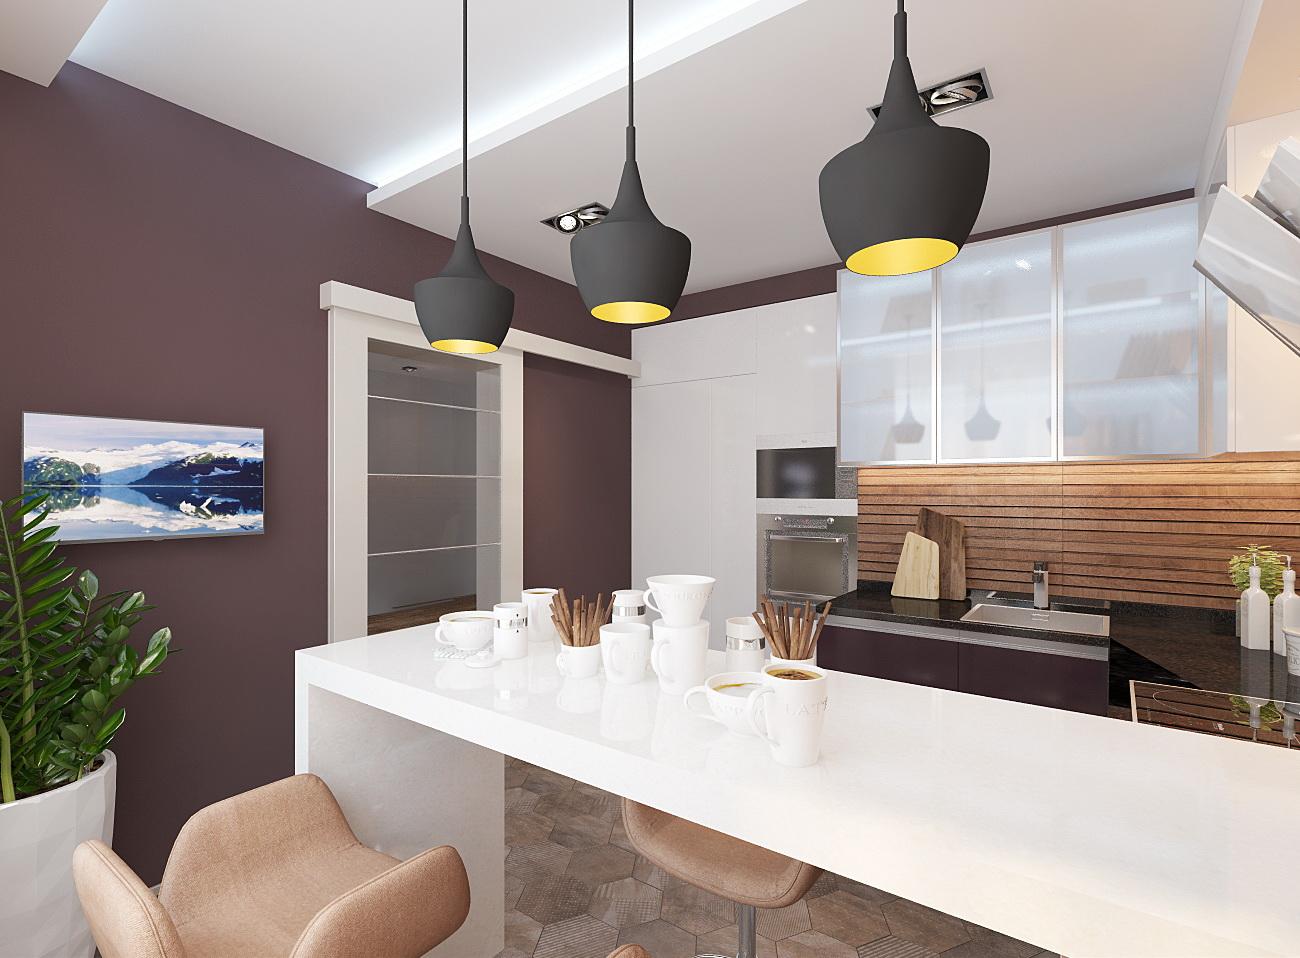 дизайн кухни 13 кв.м.